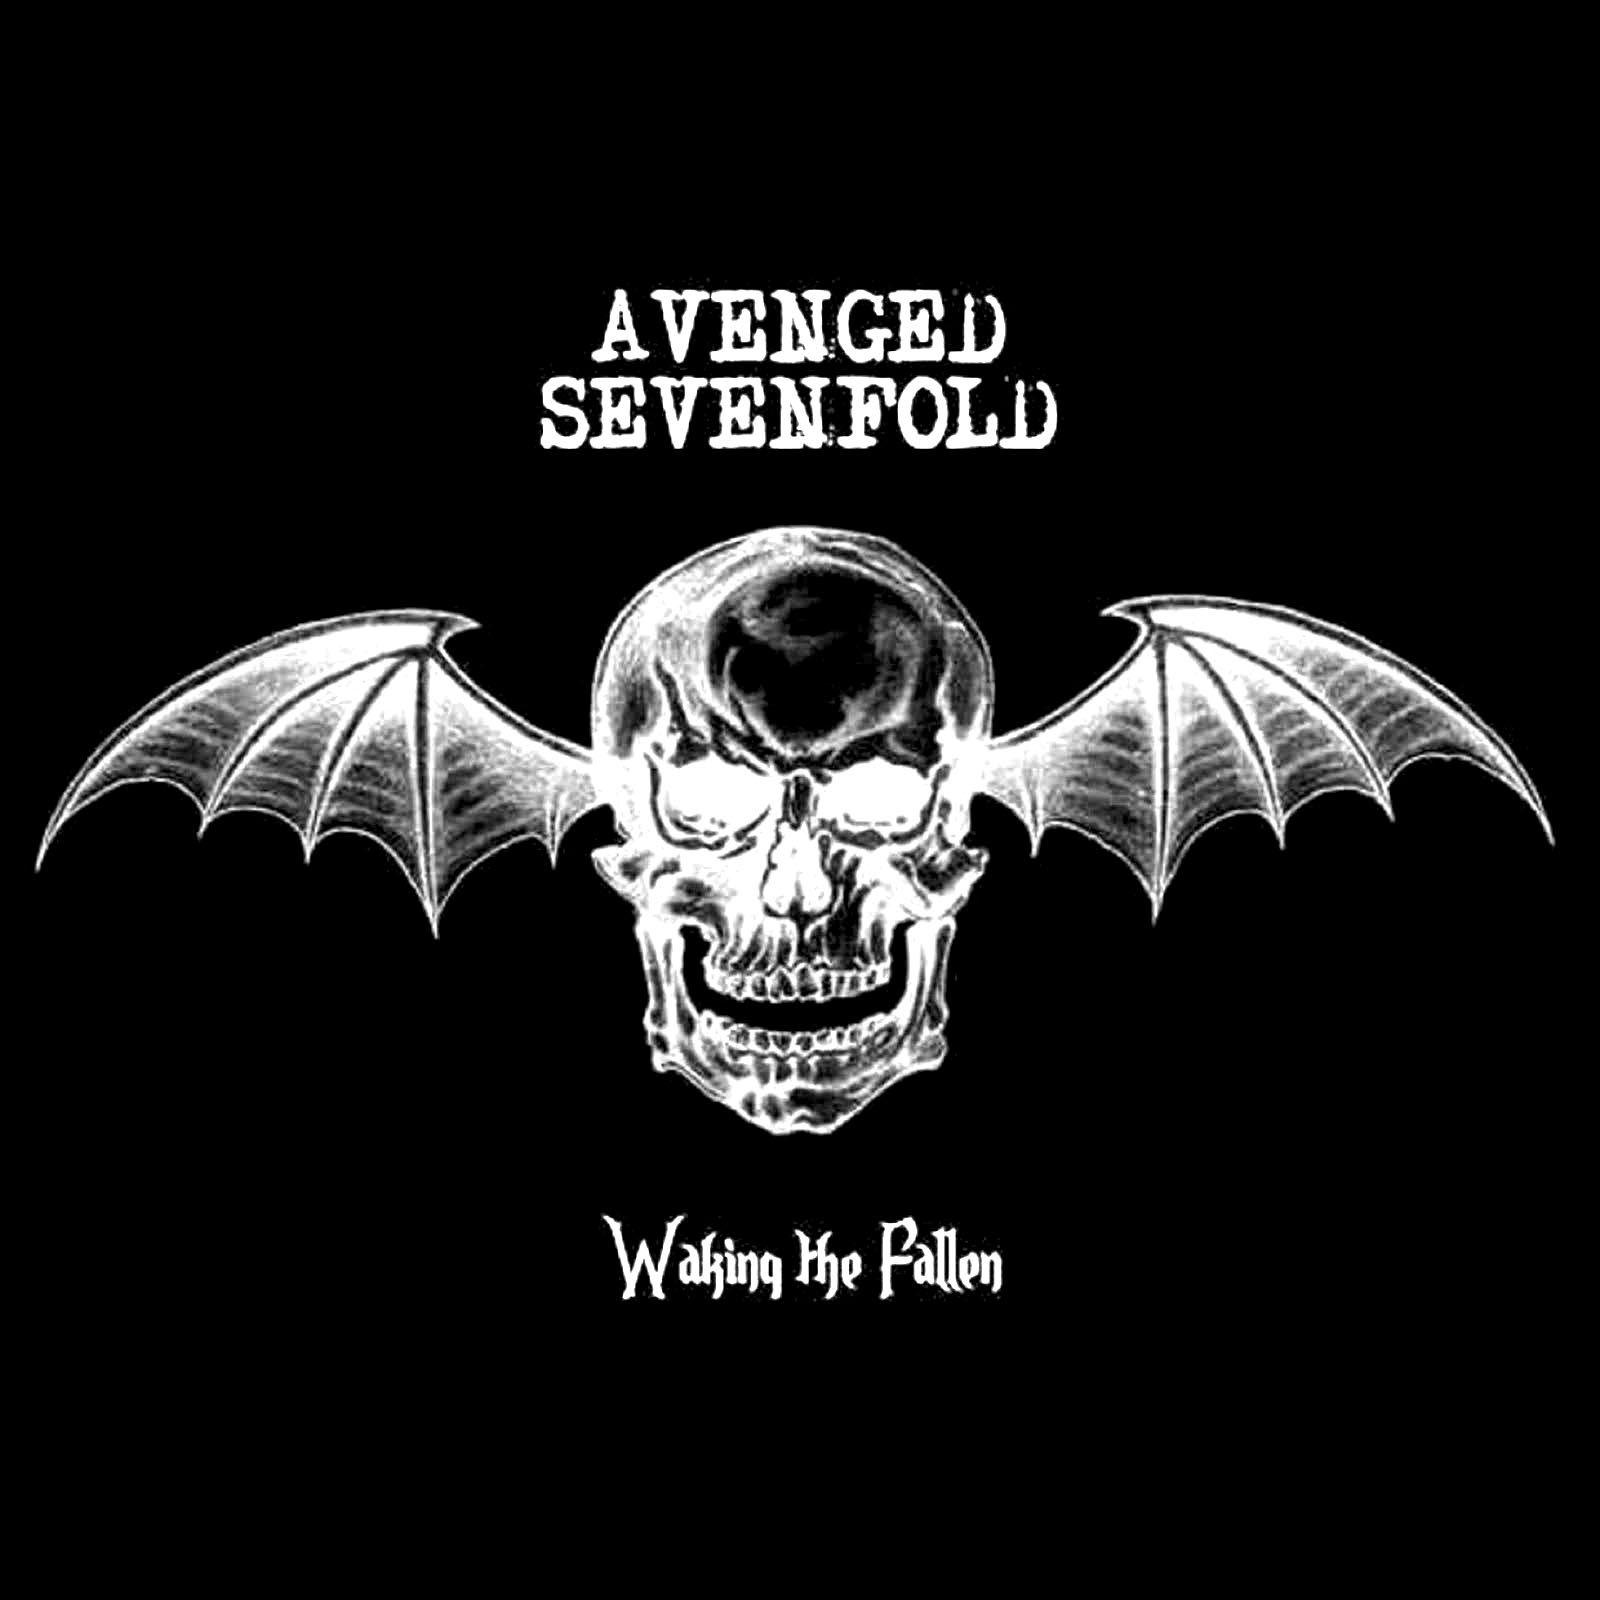 avenged sevenfold cd cover Avenged Sevenfold Waking The